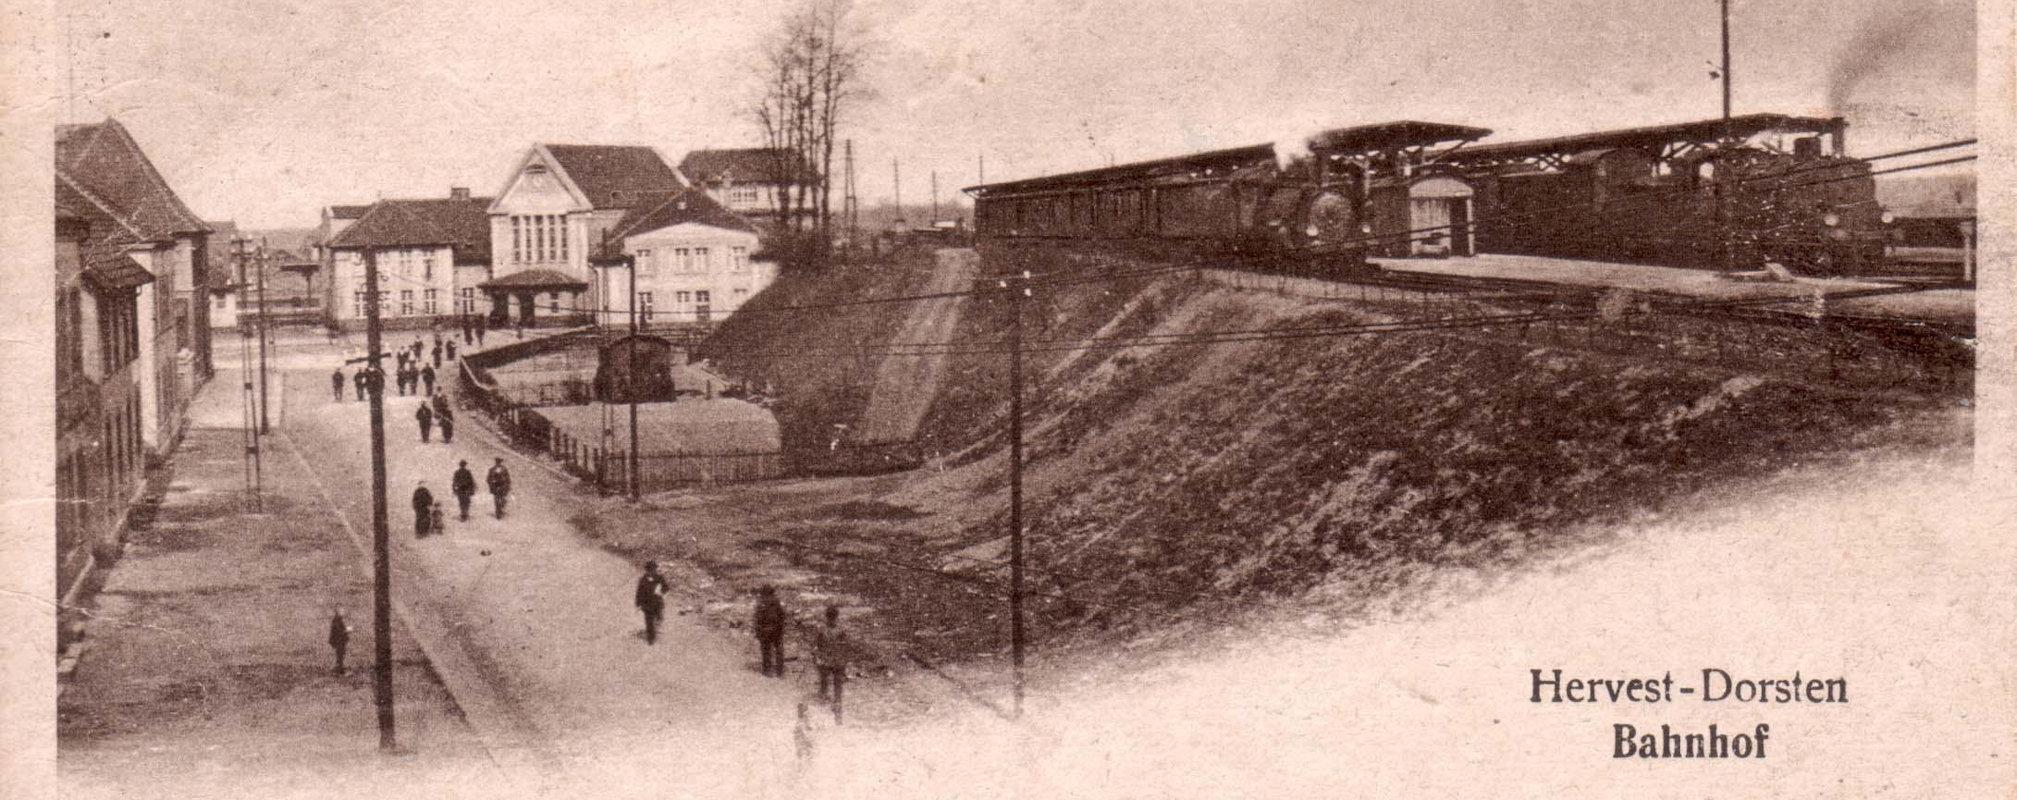 19201012-her-am-holzplatz-bahnhof-800-titel-1